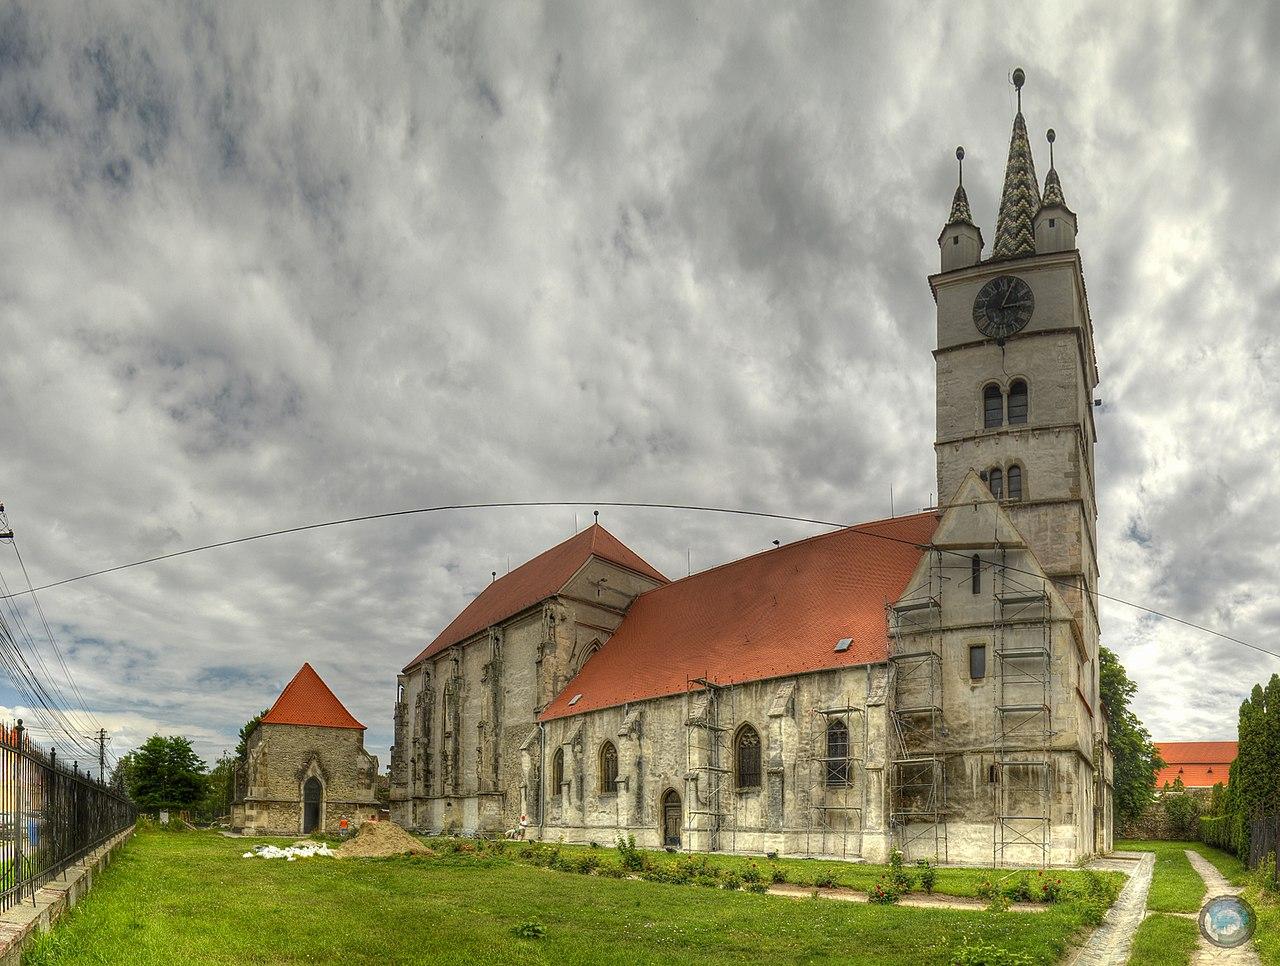 Ansamblul bisericii evanghelice din Sebeș 4.jpg